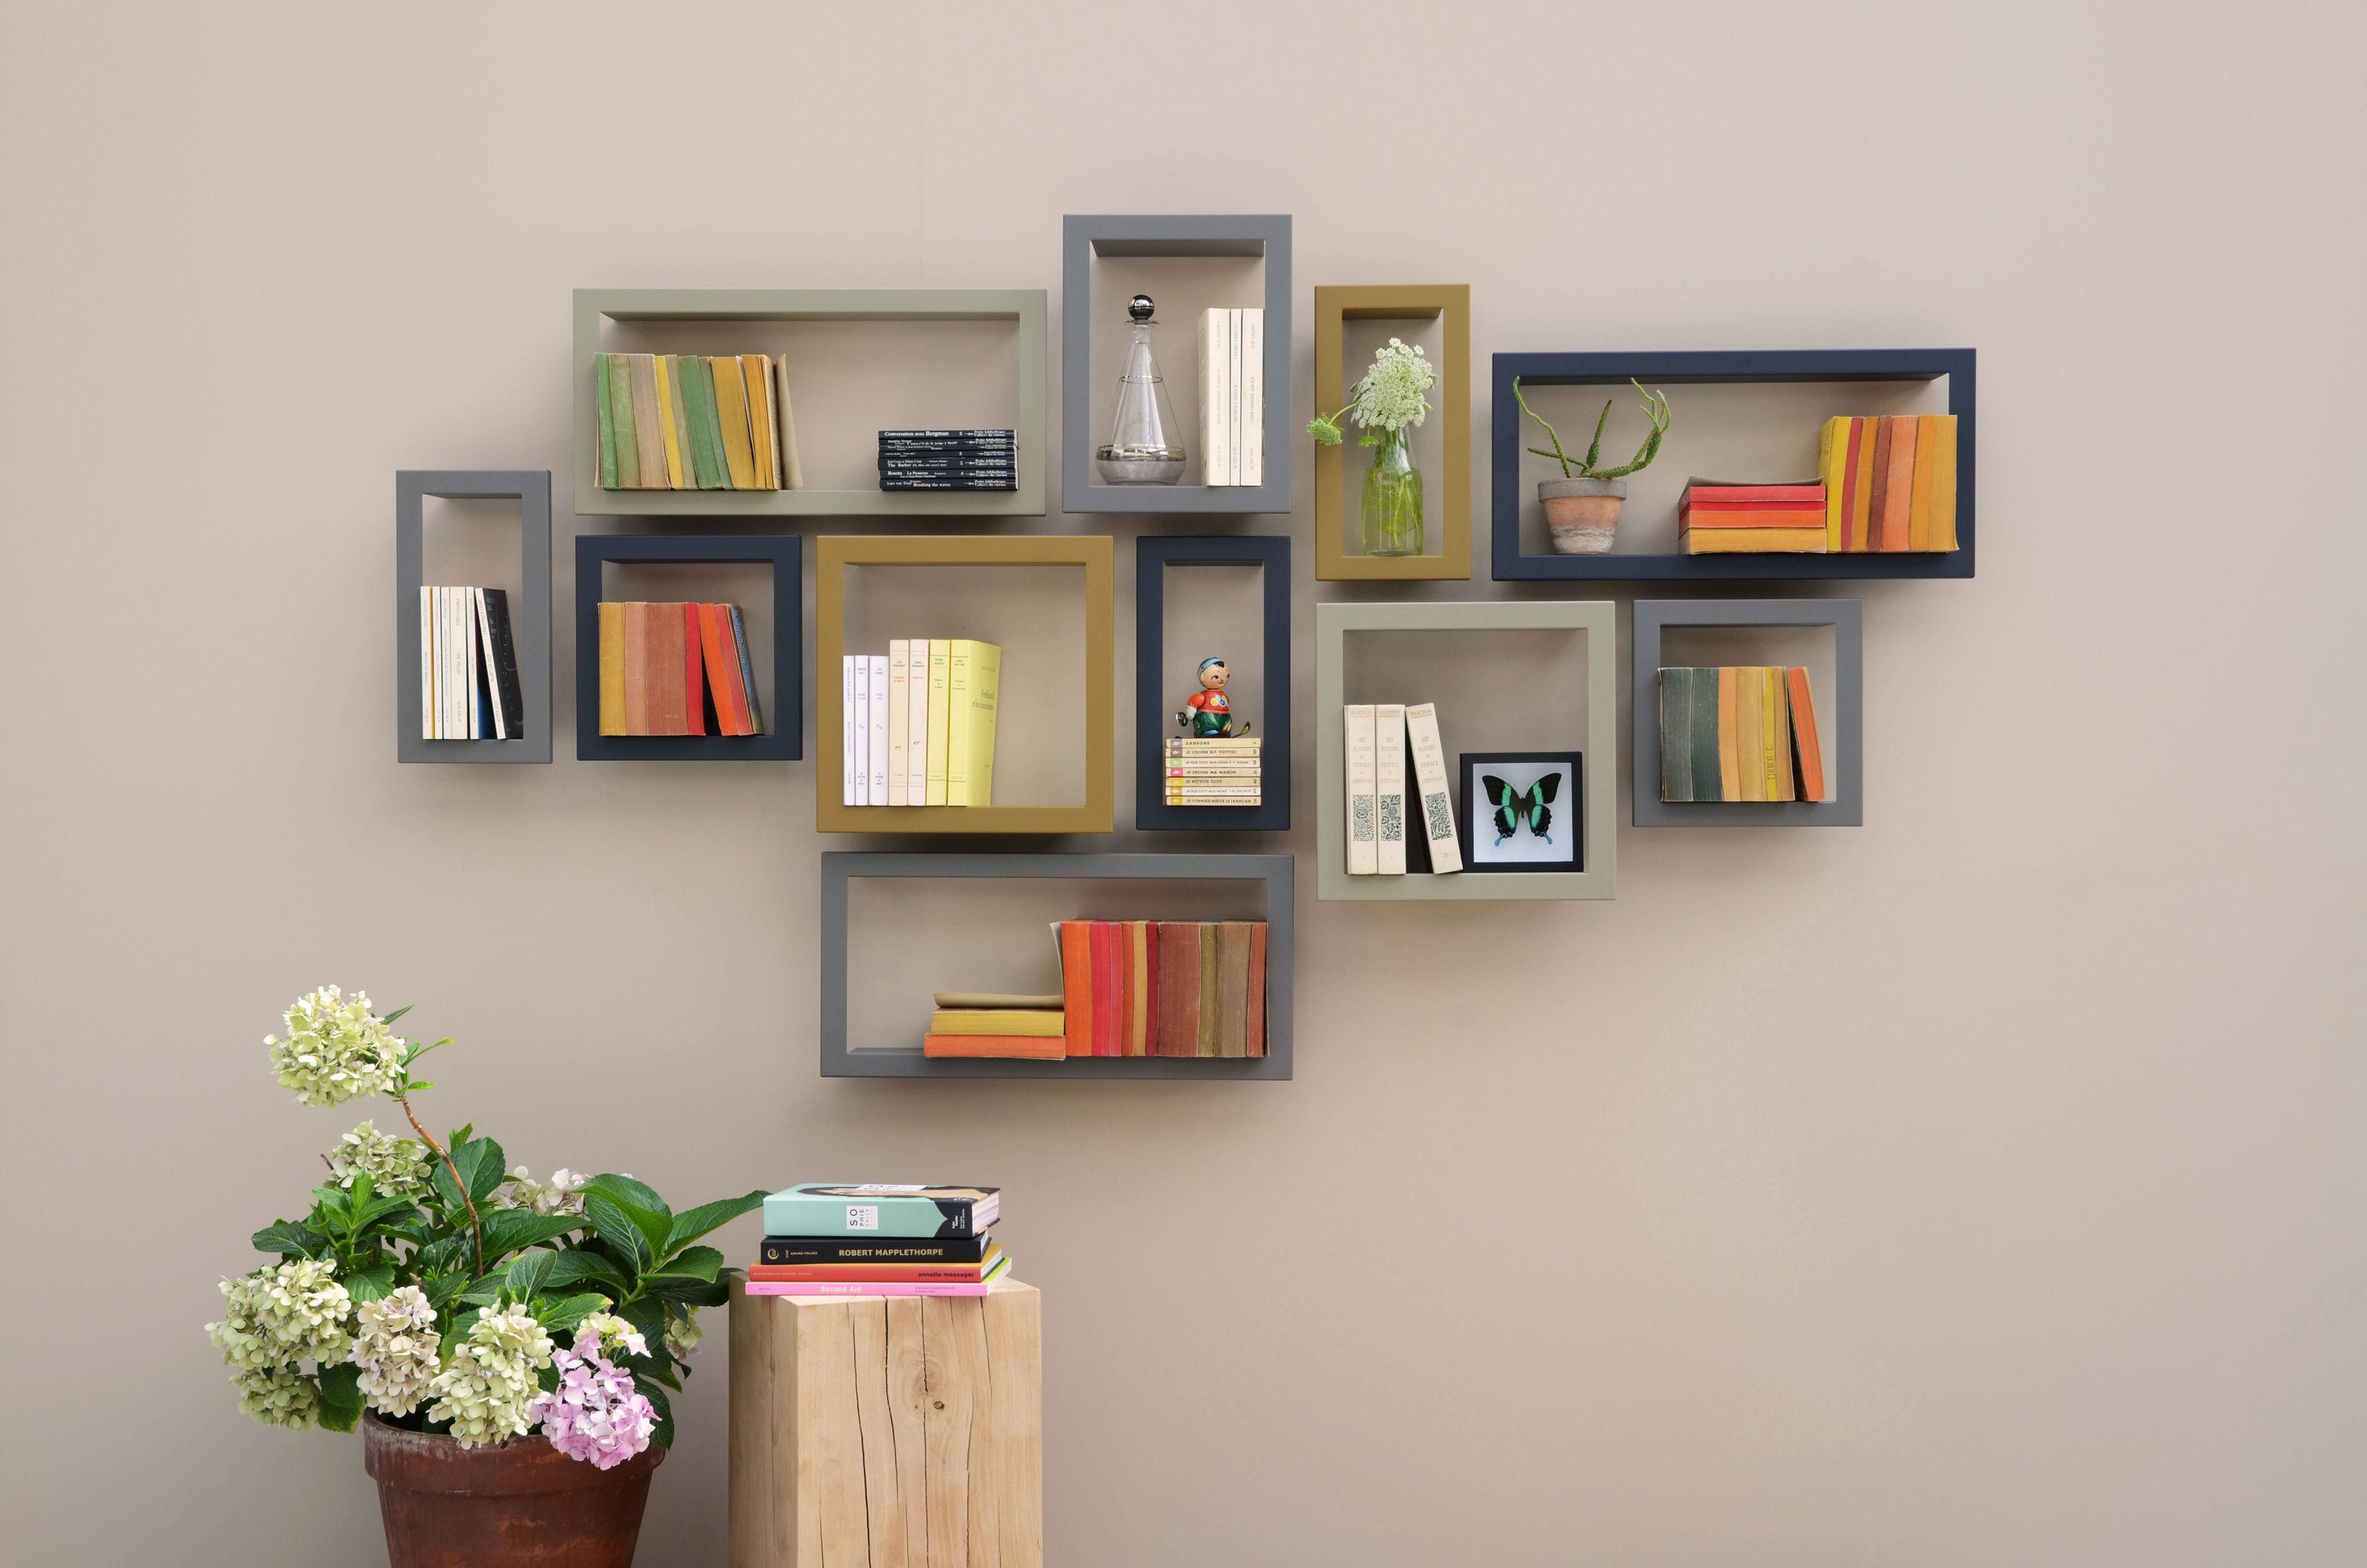 etag re bigstick m tal l 36 x h 36 cm blanc presse citron. Black Bedroom Furniture Sets. Home Design Ideas